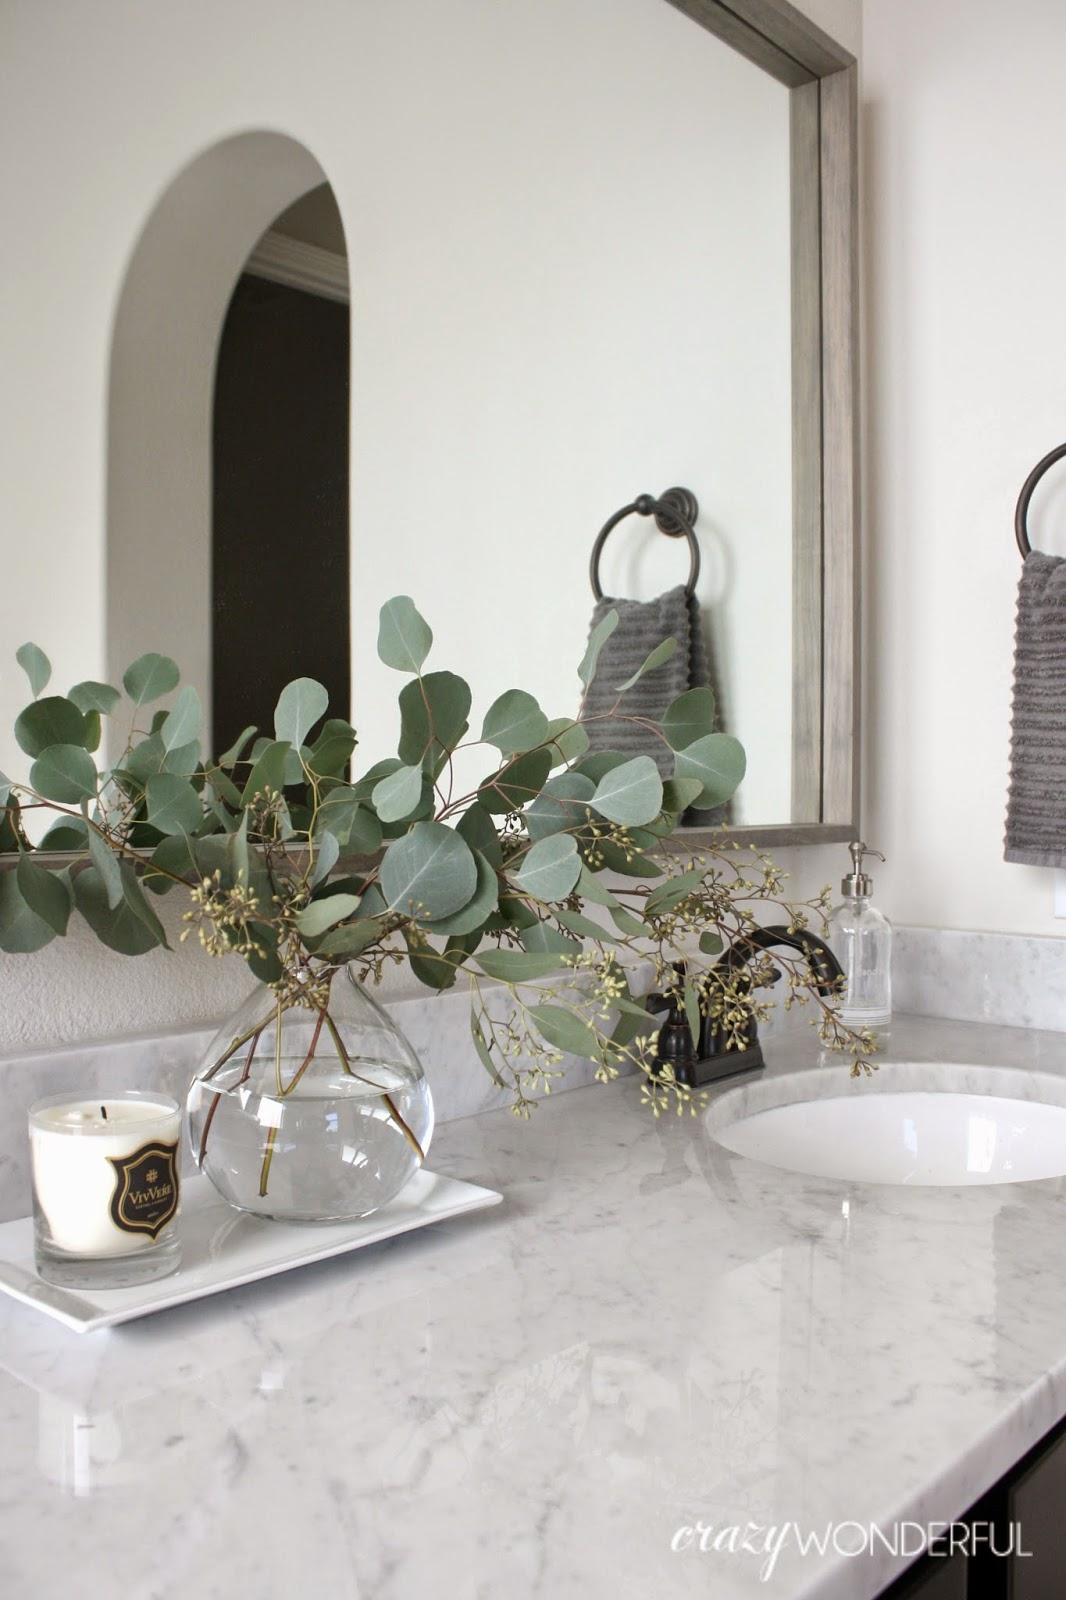 Framed Bathroom Mirrors Ideas: Framed Bathroom Mirror